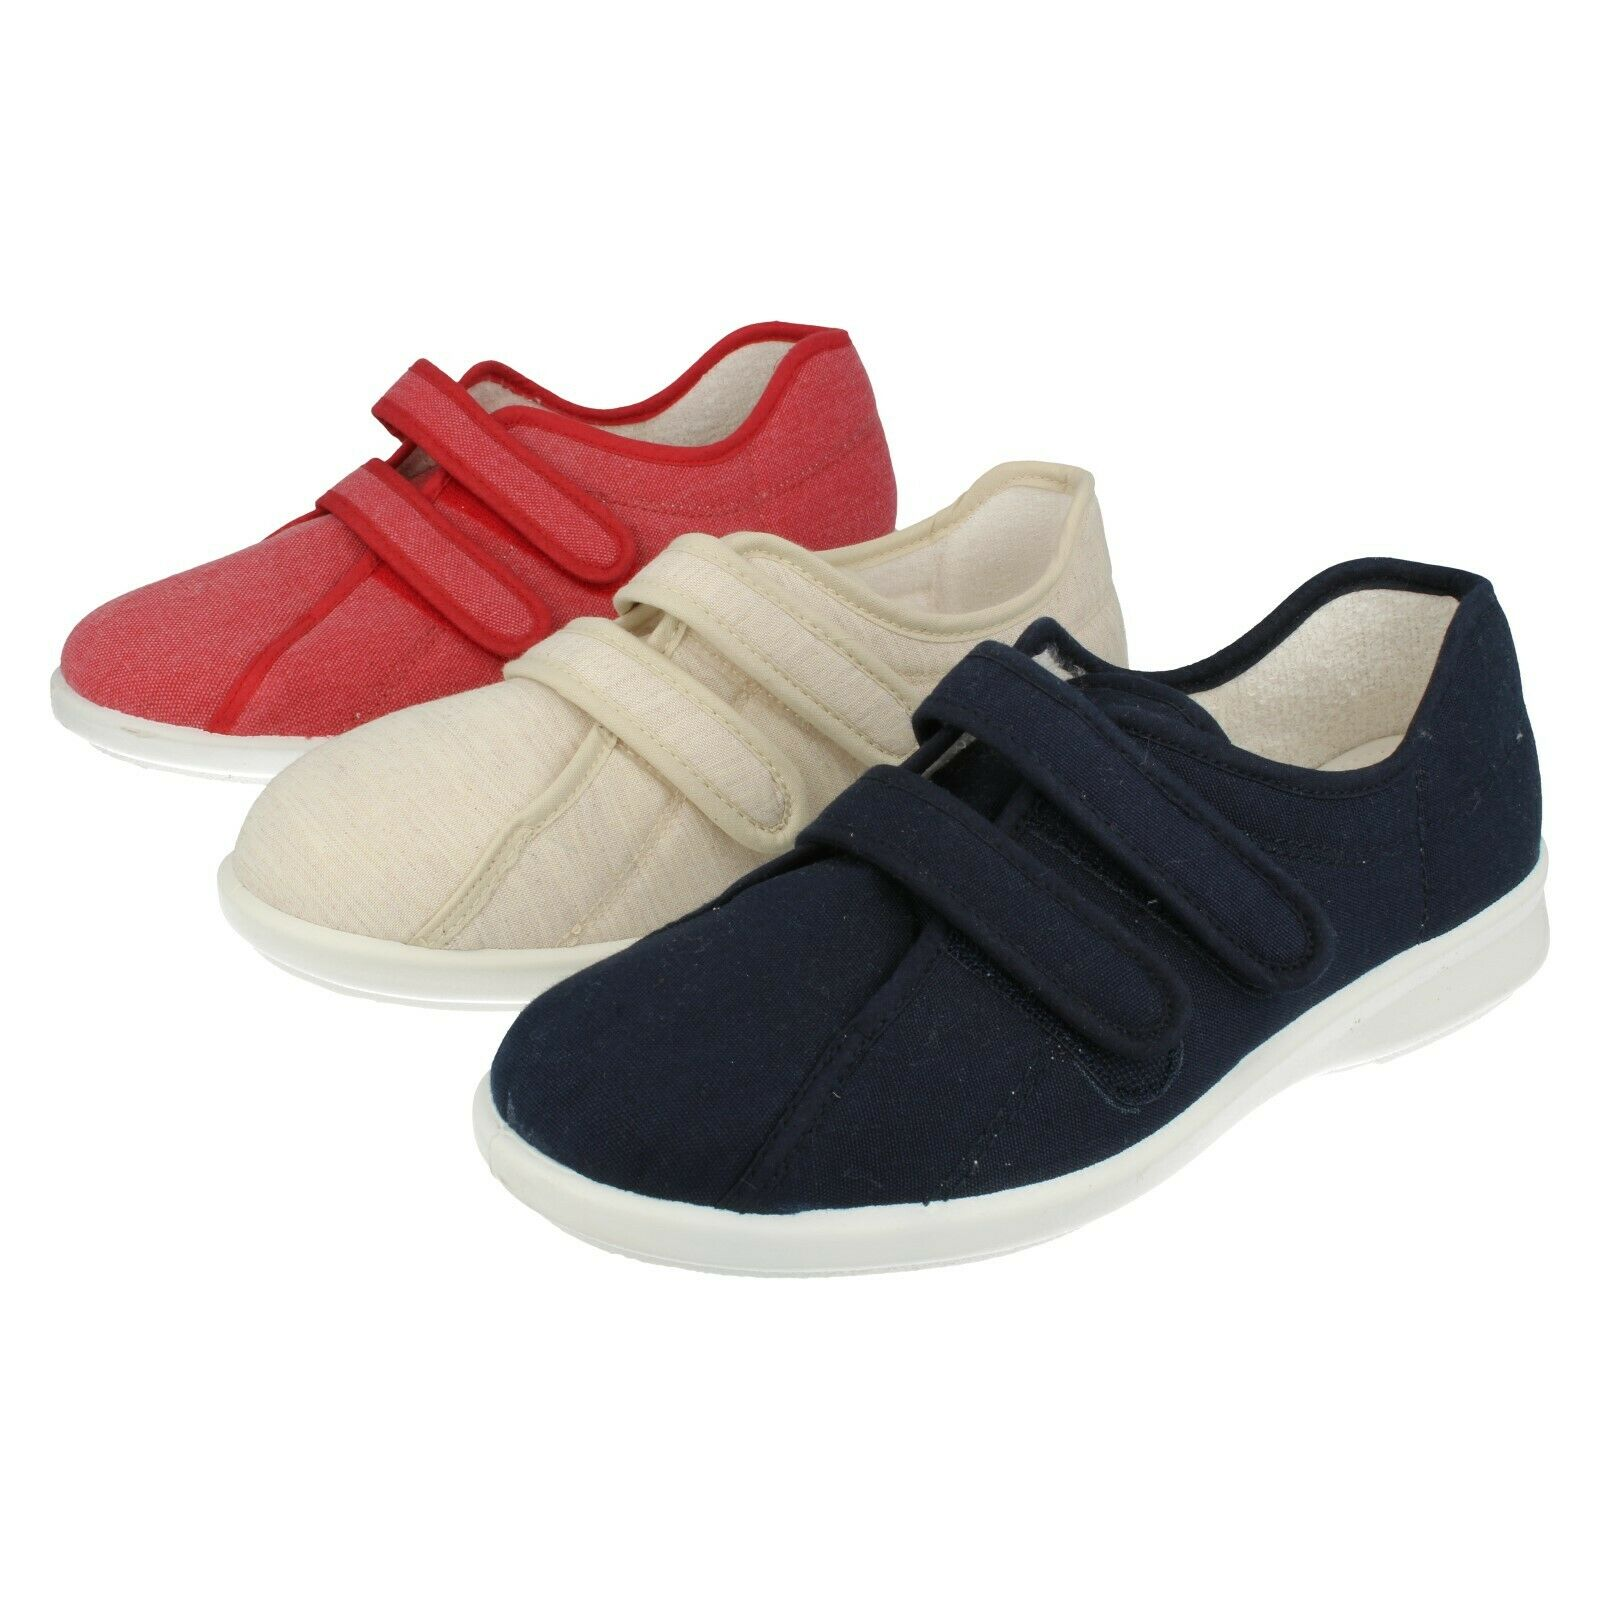 Señoras Azul Marino Rojo Beige Beige Beige Rip cinta fácil B Zapatos De Lona Celene  oferta de tienda